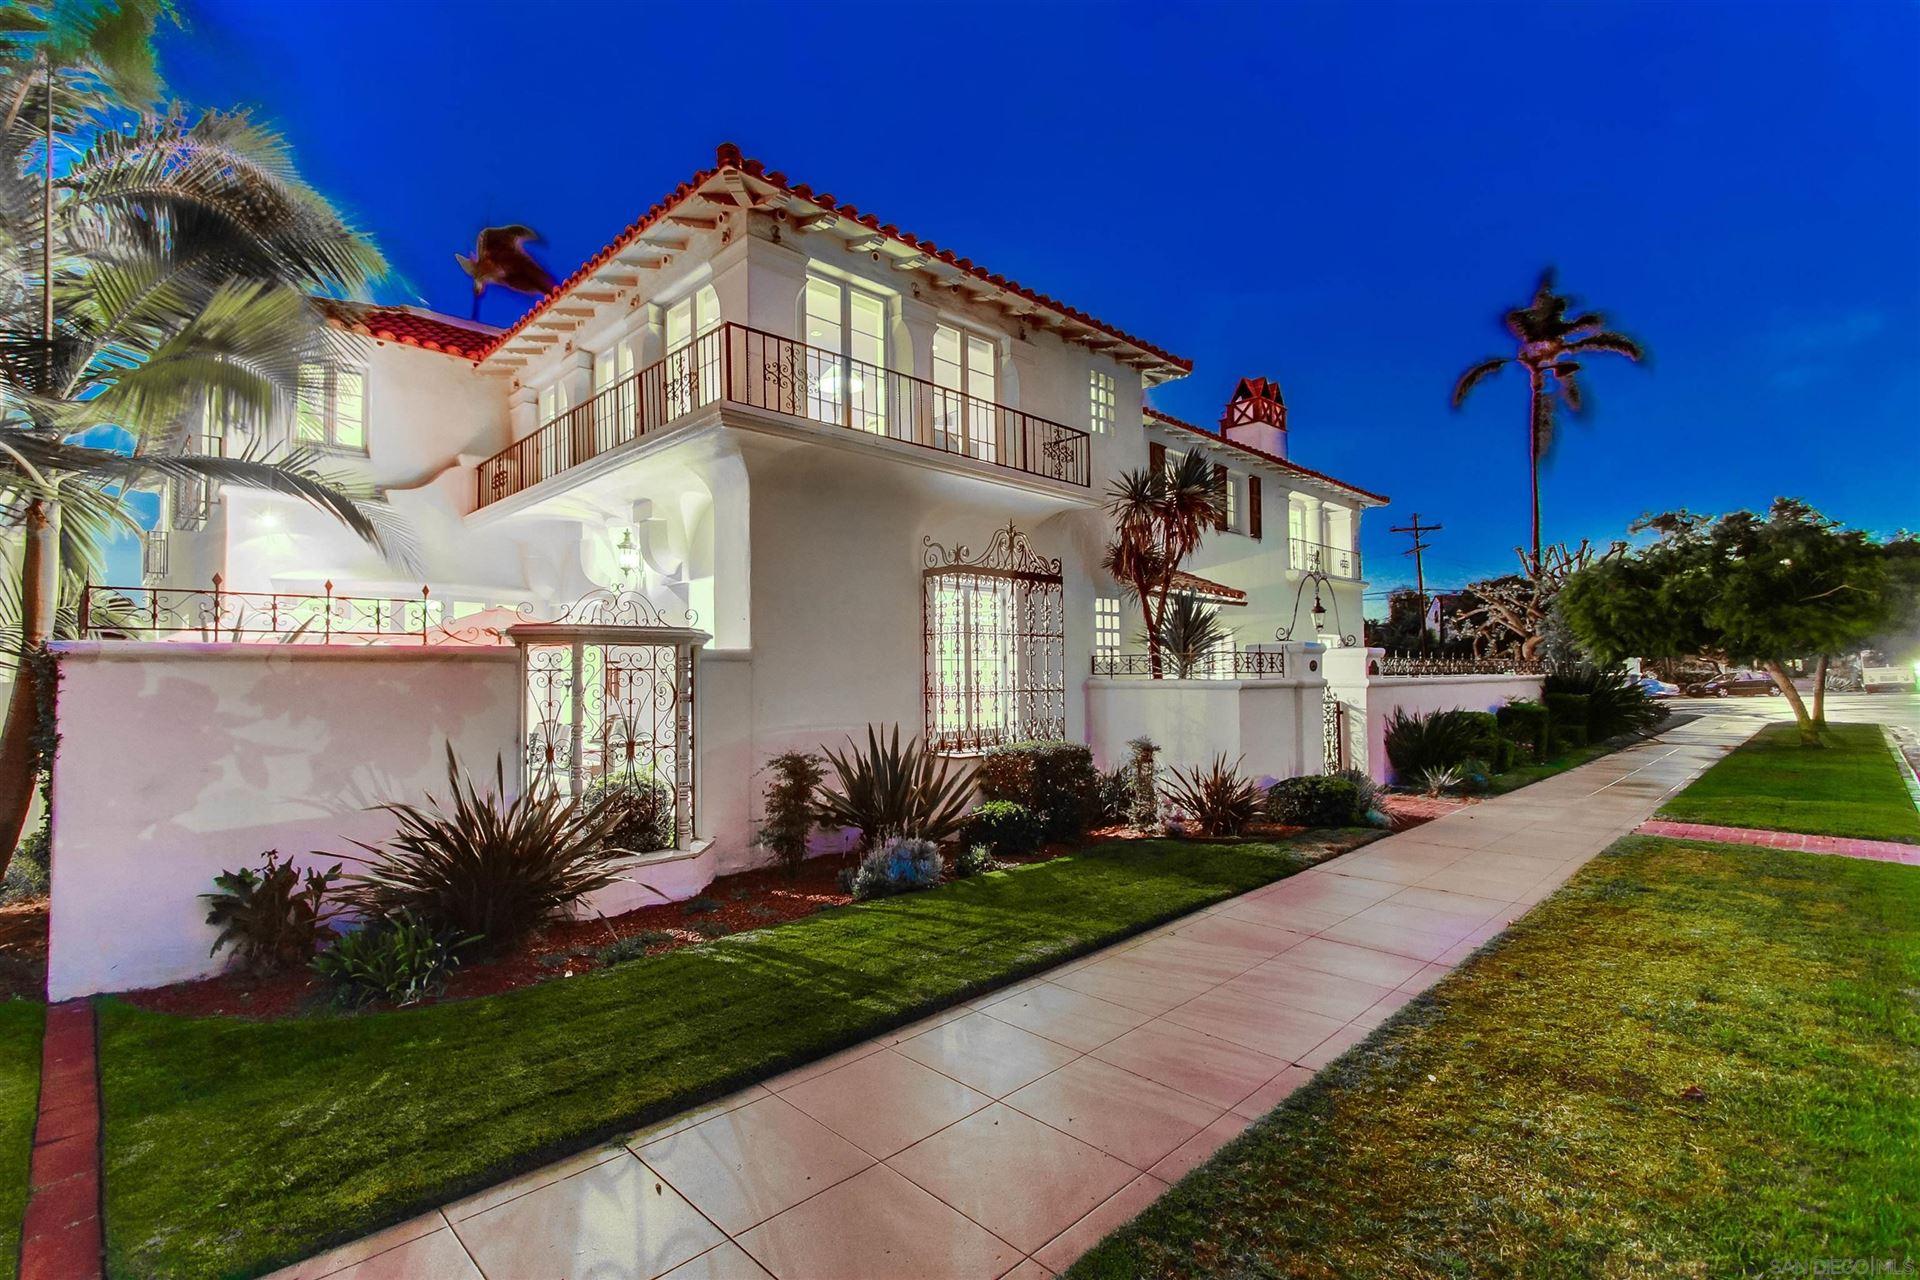 Photo of 1010 Olive Avenue, Coronado, CA 92118 (MLS # 210025905)